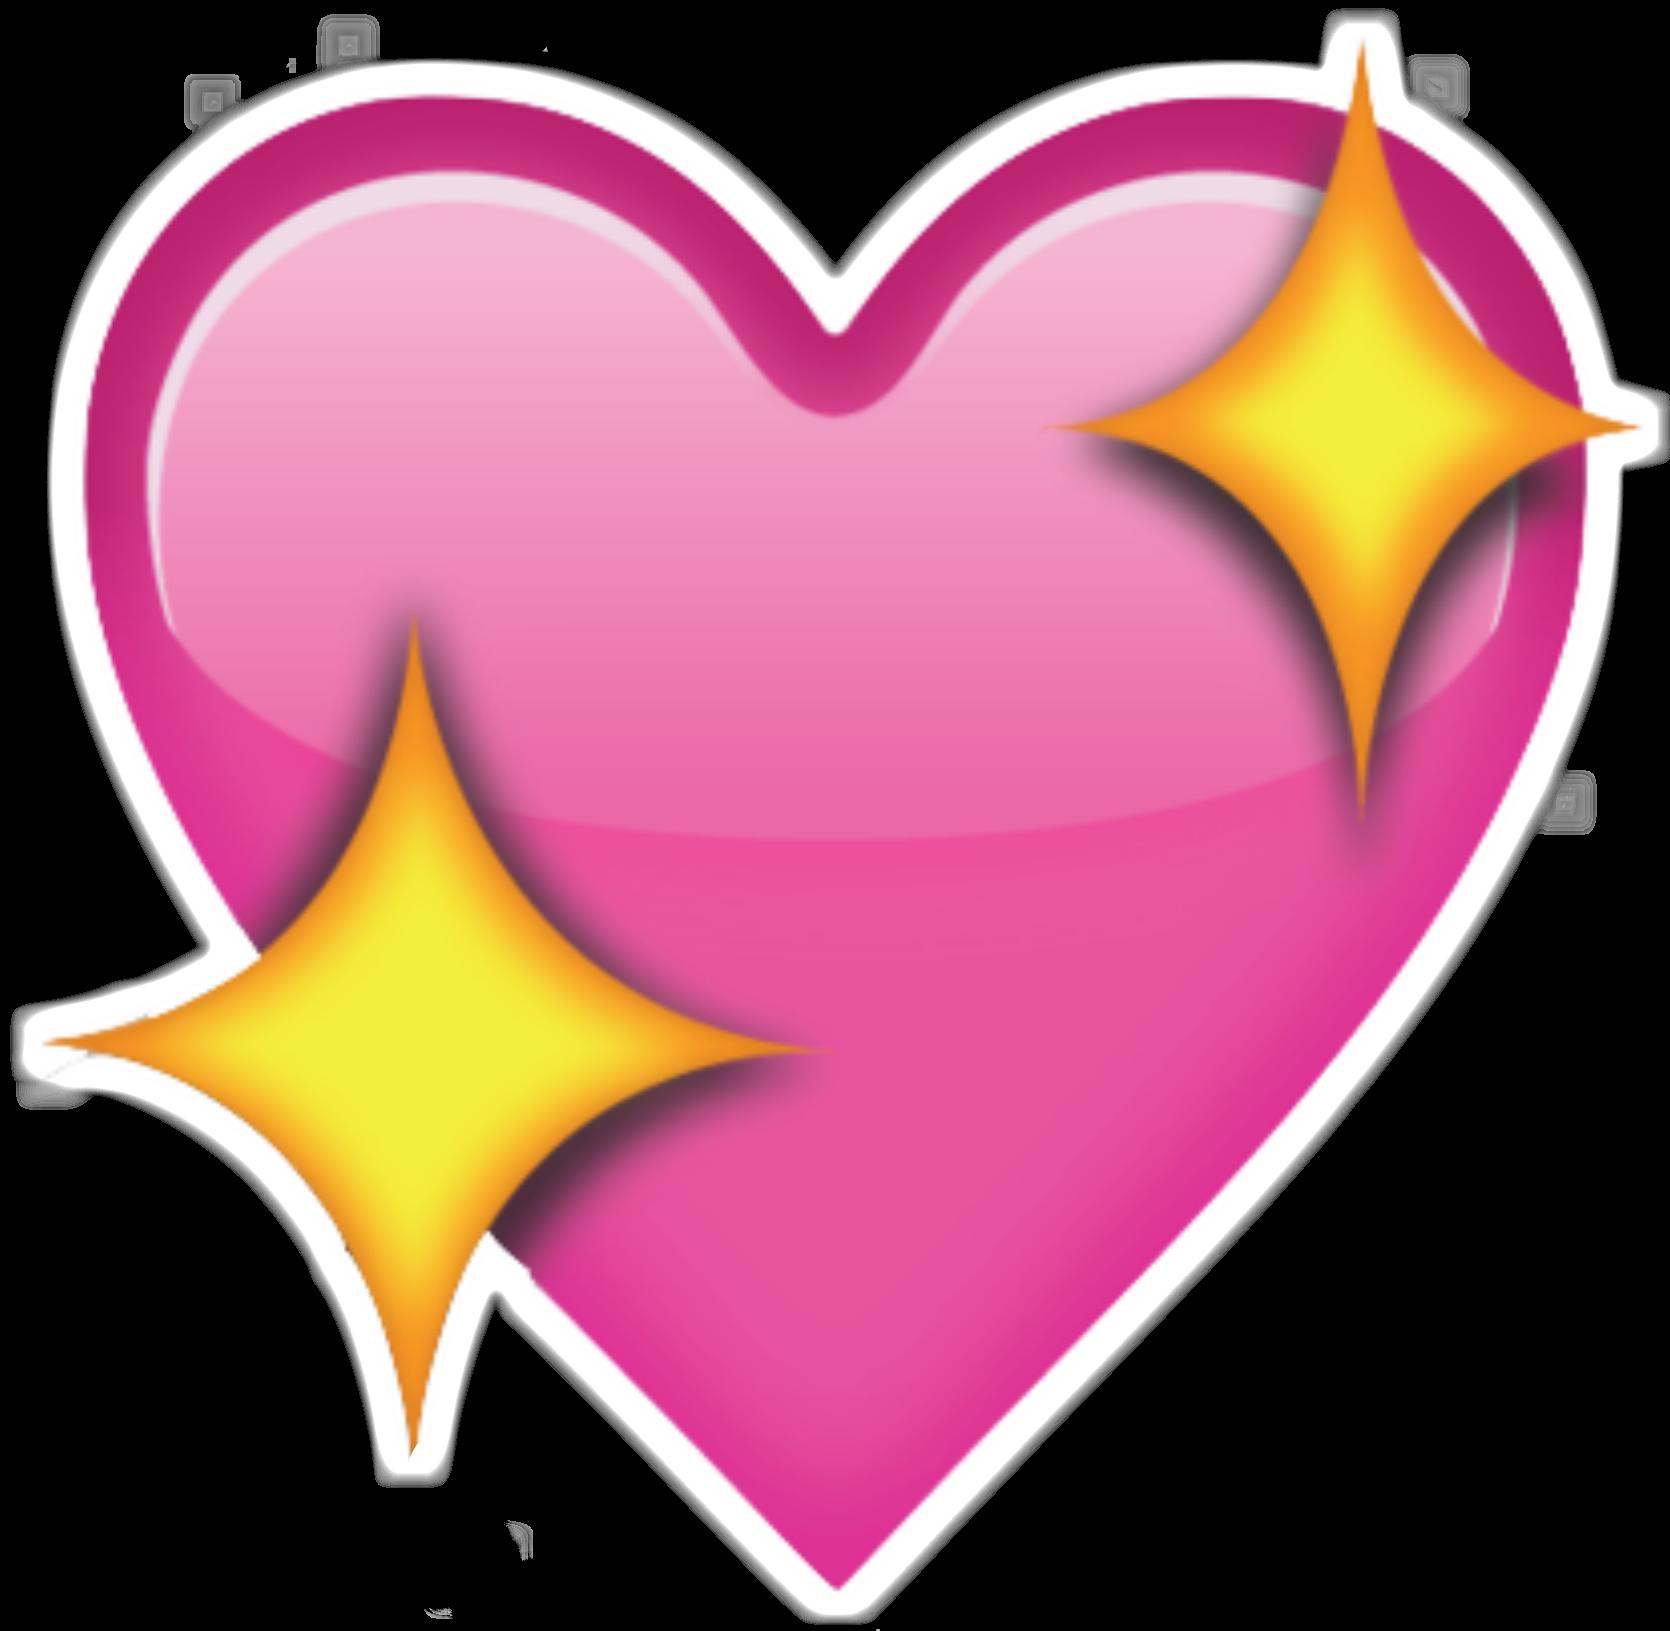 1670x1631 Pink Emoji Heart Png